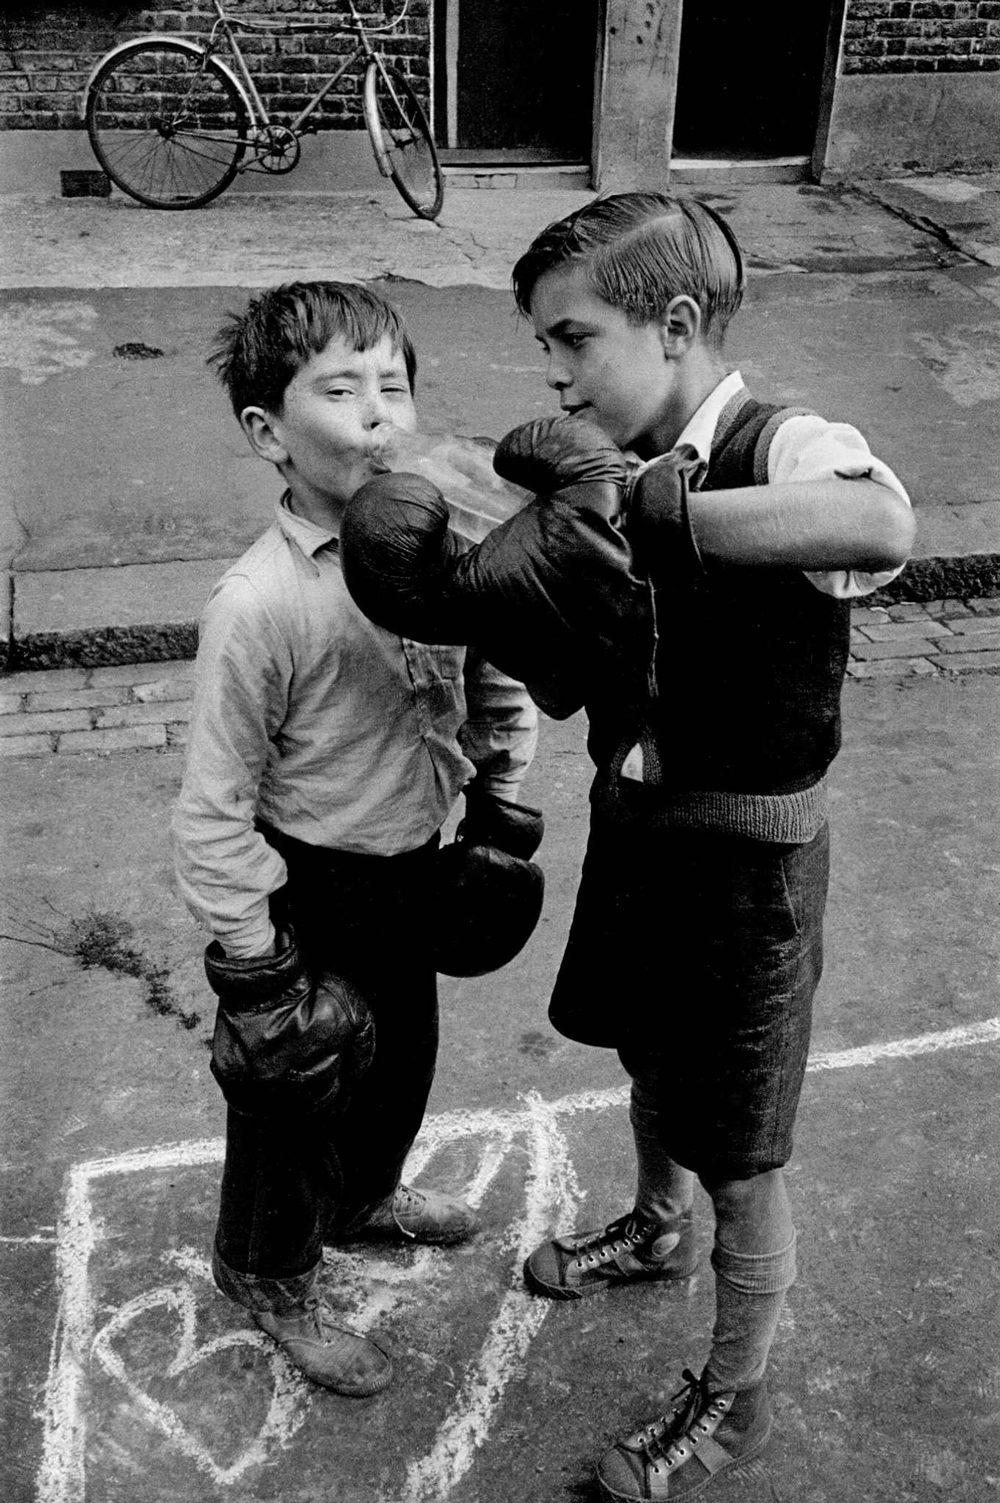 London, Lambeth - boxing boys (close-up)